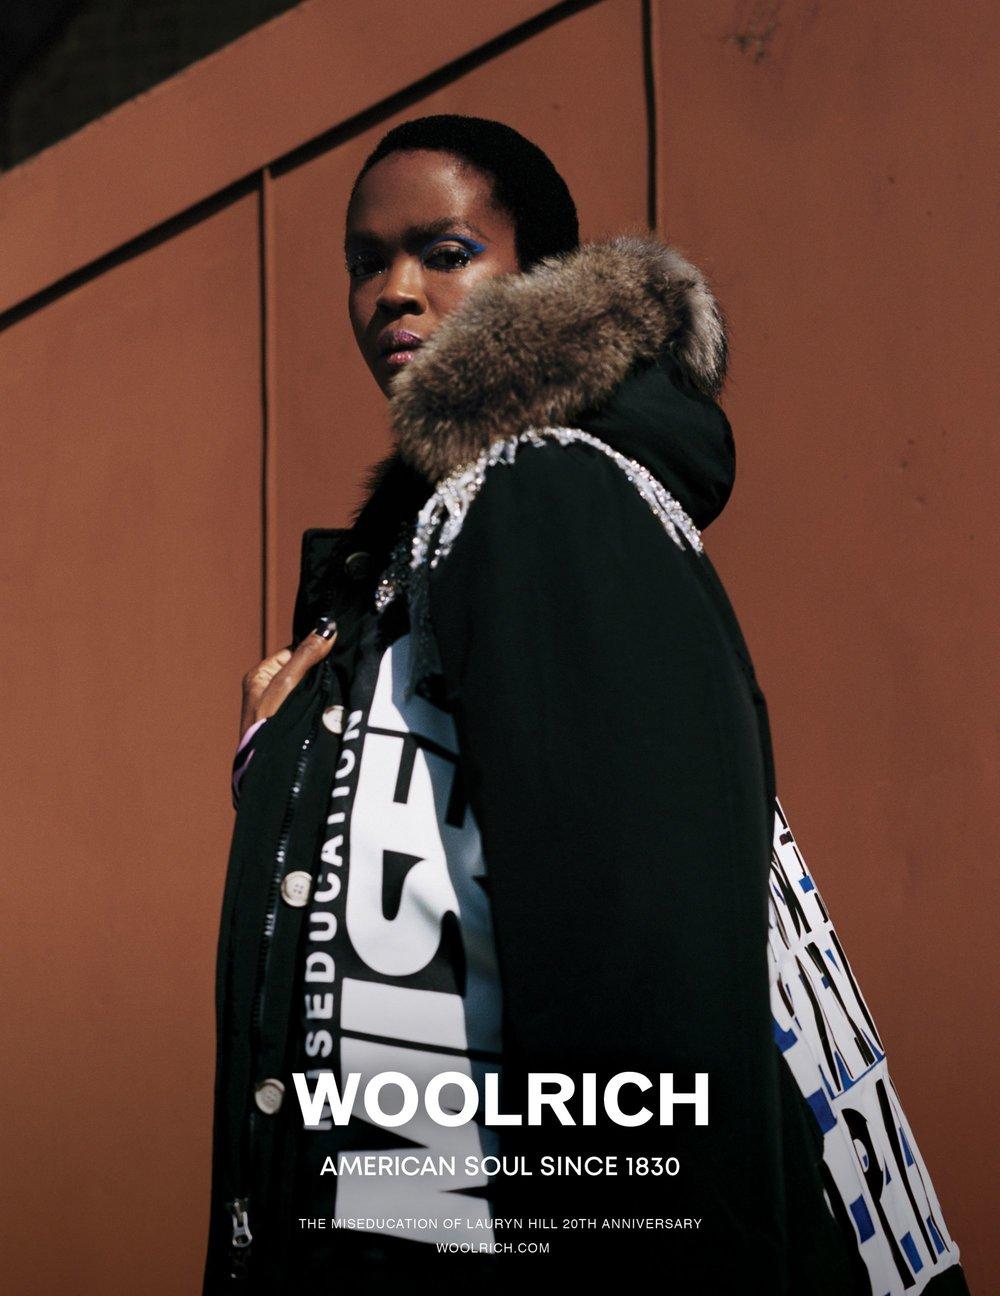 Woolrich-FW-18-ADV-Campaign-10.jpg